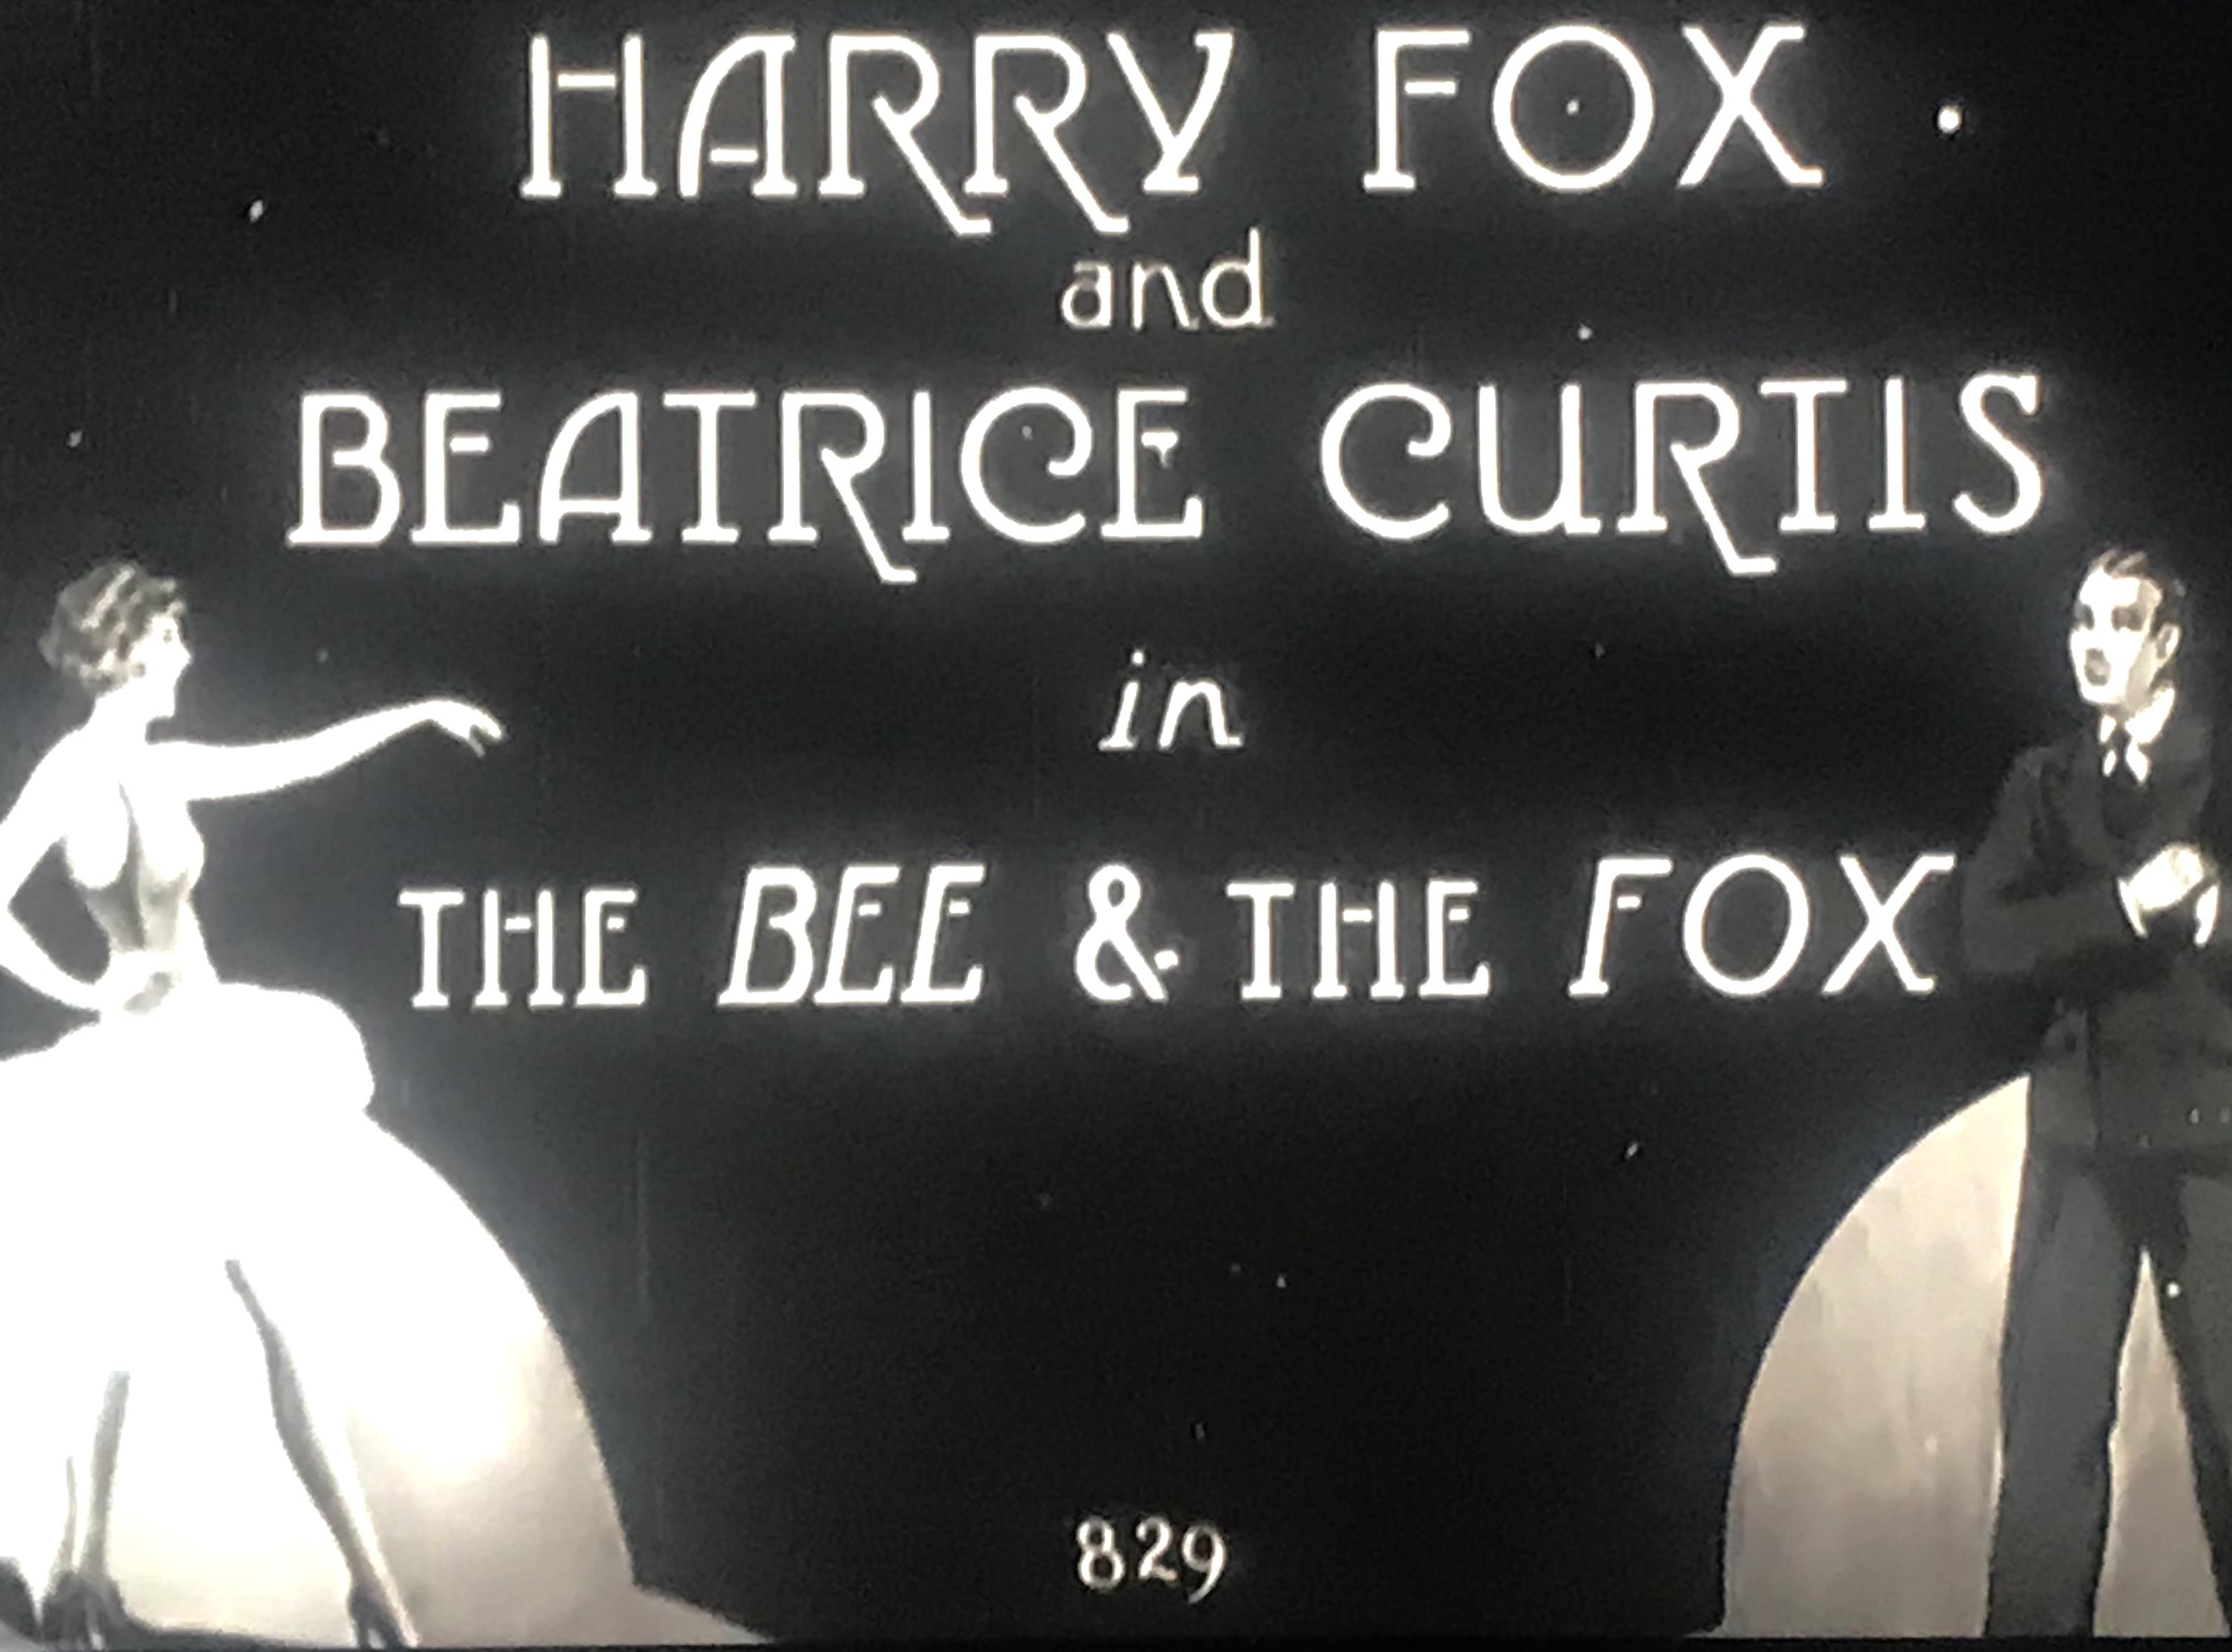 The Bee & the Fox (1929)